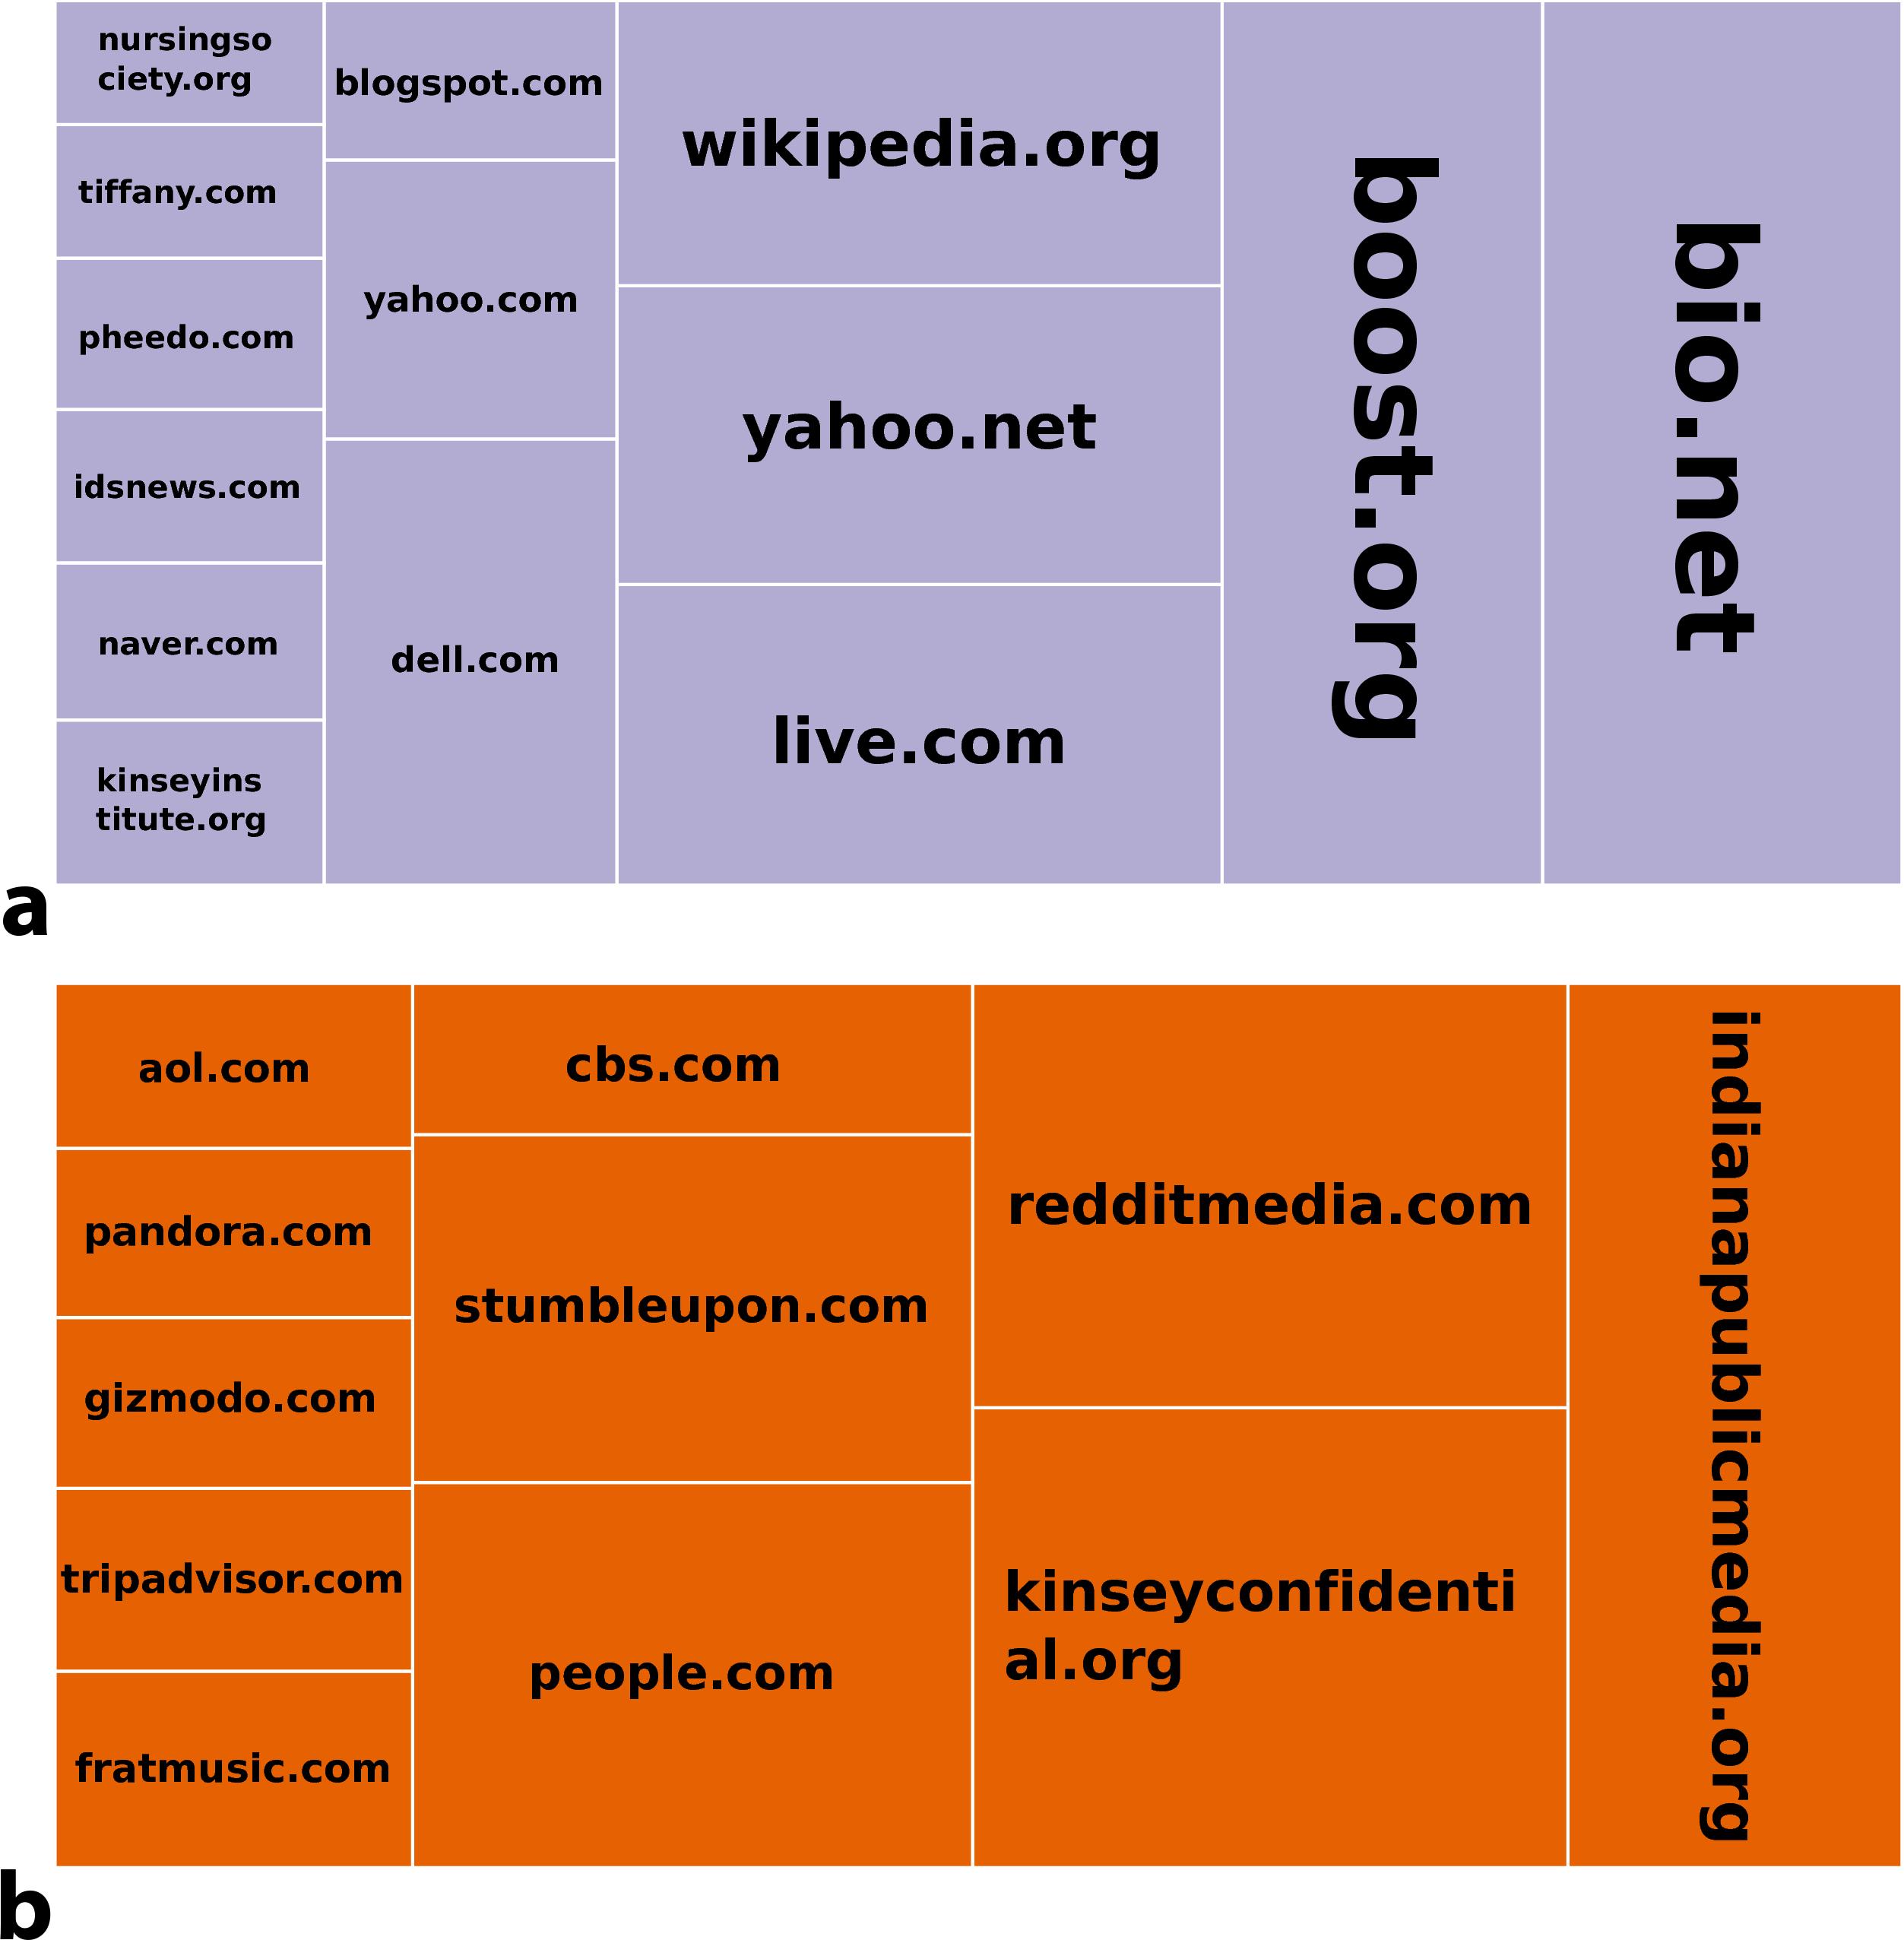 Measuring online social bubbles [PeerJ]